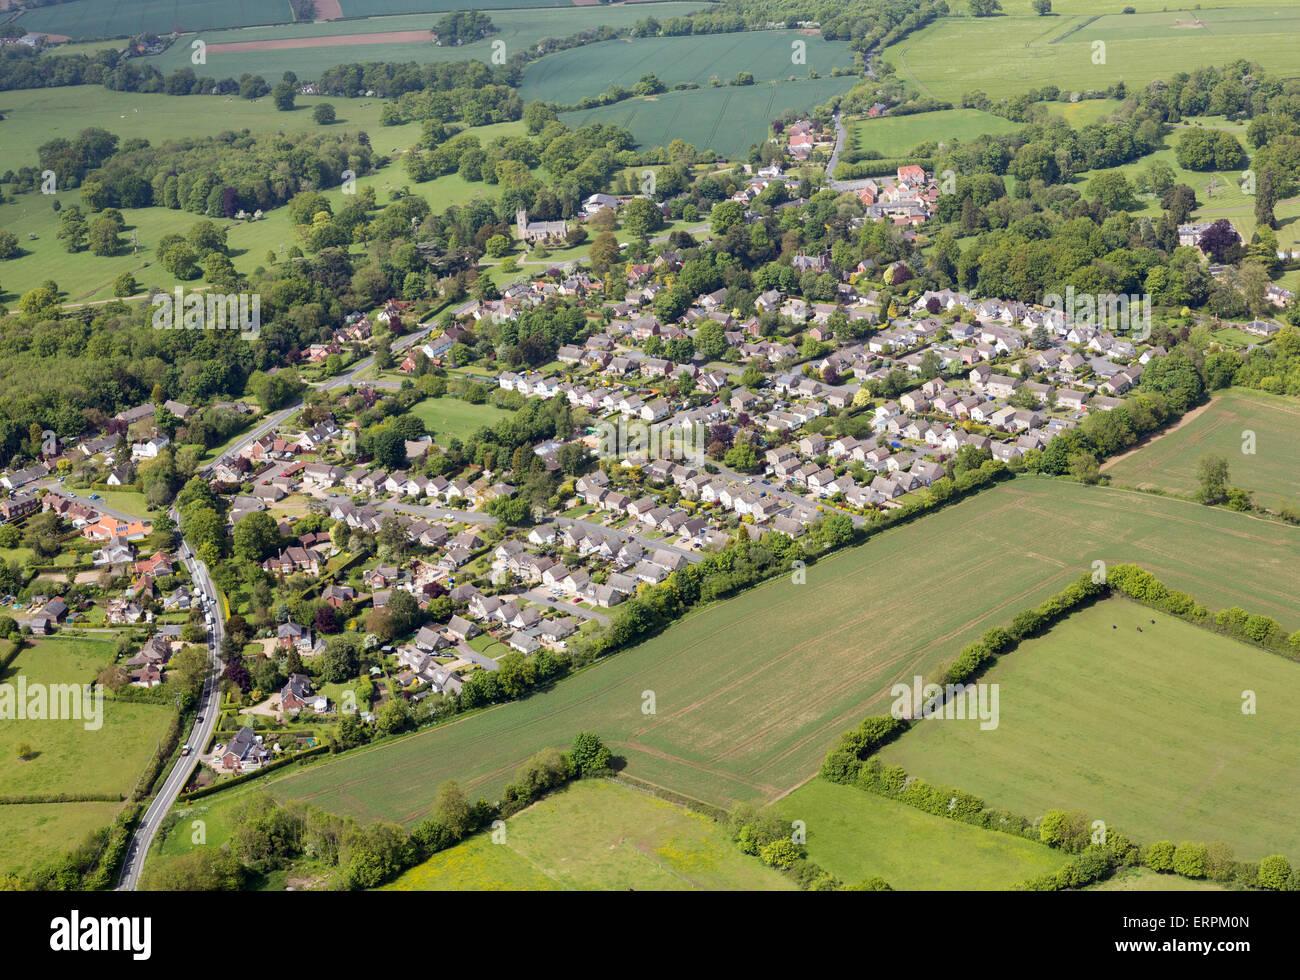 aerial photo of Horringer village in Suffolk - Stock Image